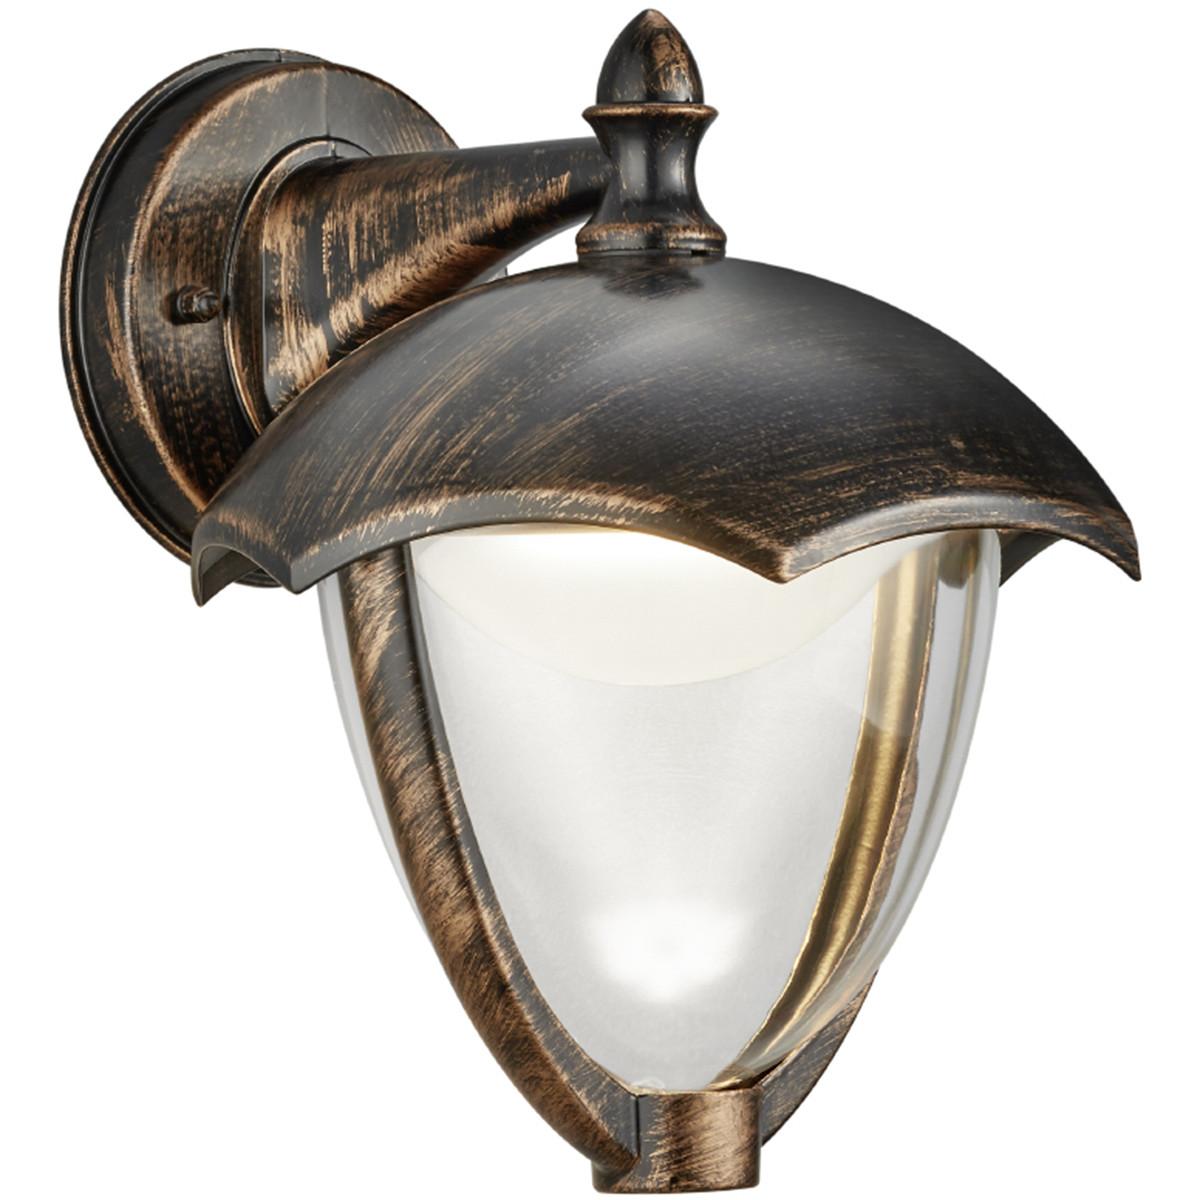 LED Tuinverlichting - Tuinlamp - Trion Grichto - Wand Omlaag - 6W - Antiek Roestkleur - Aluminium